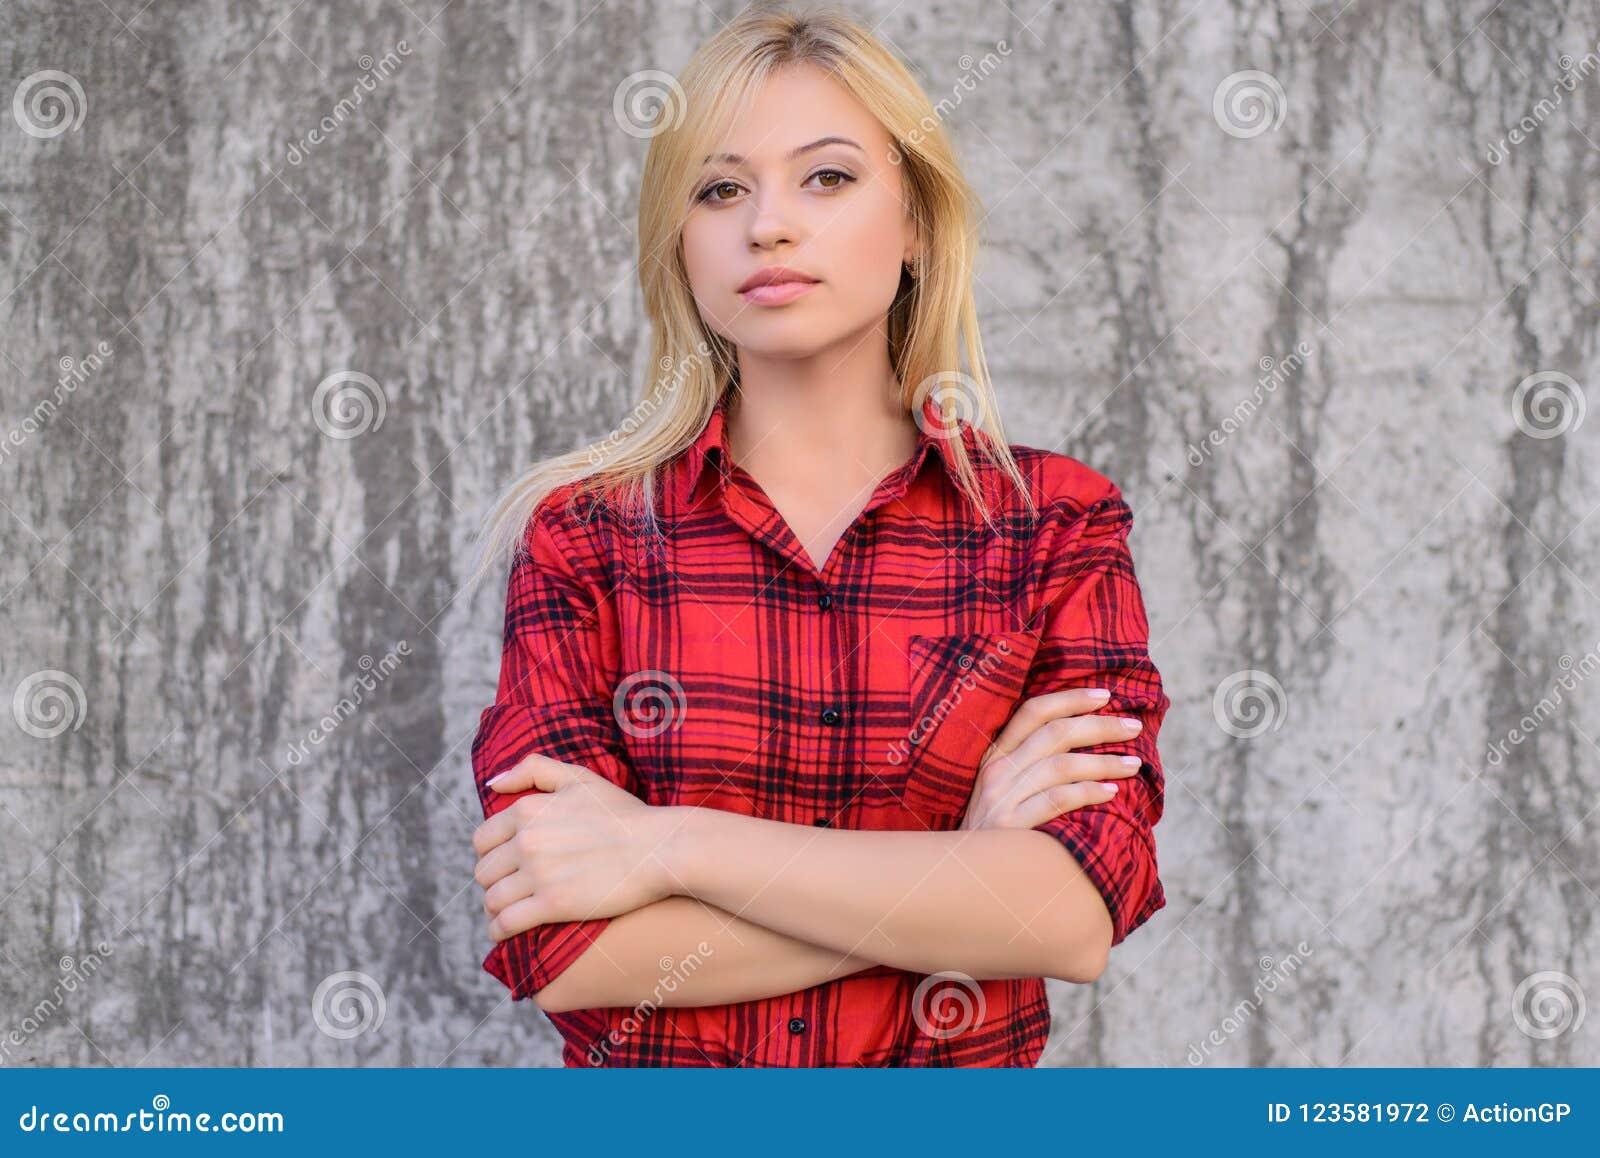 d49fb0de9f2 Confident Calm Woman With Crossed Arms